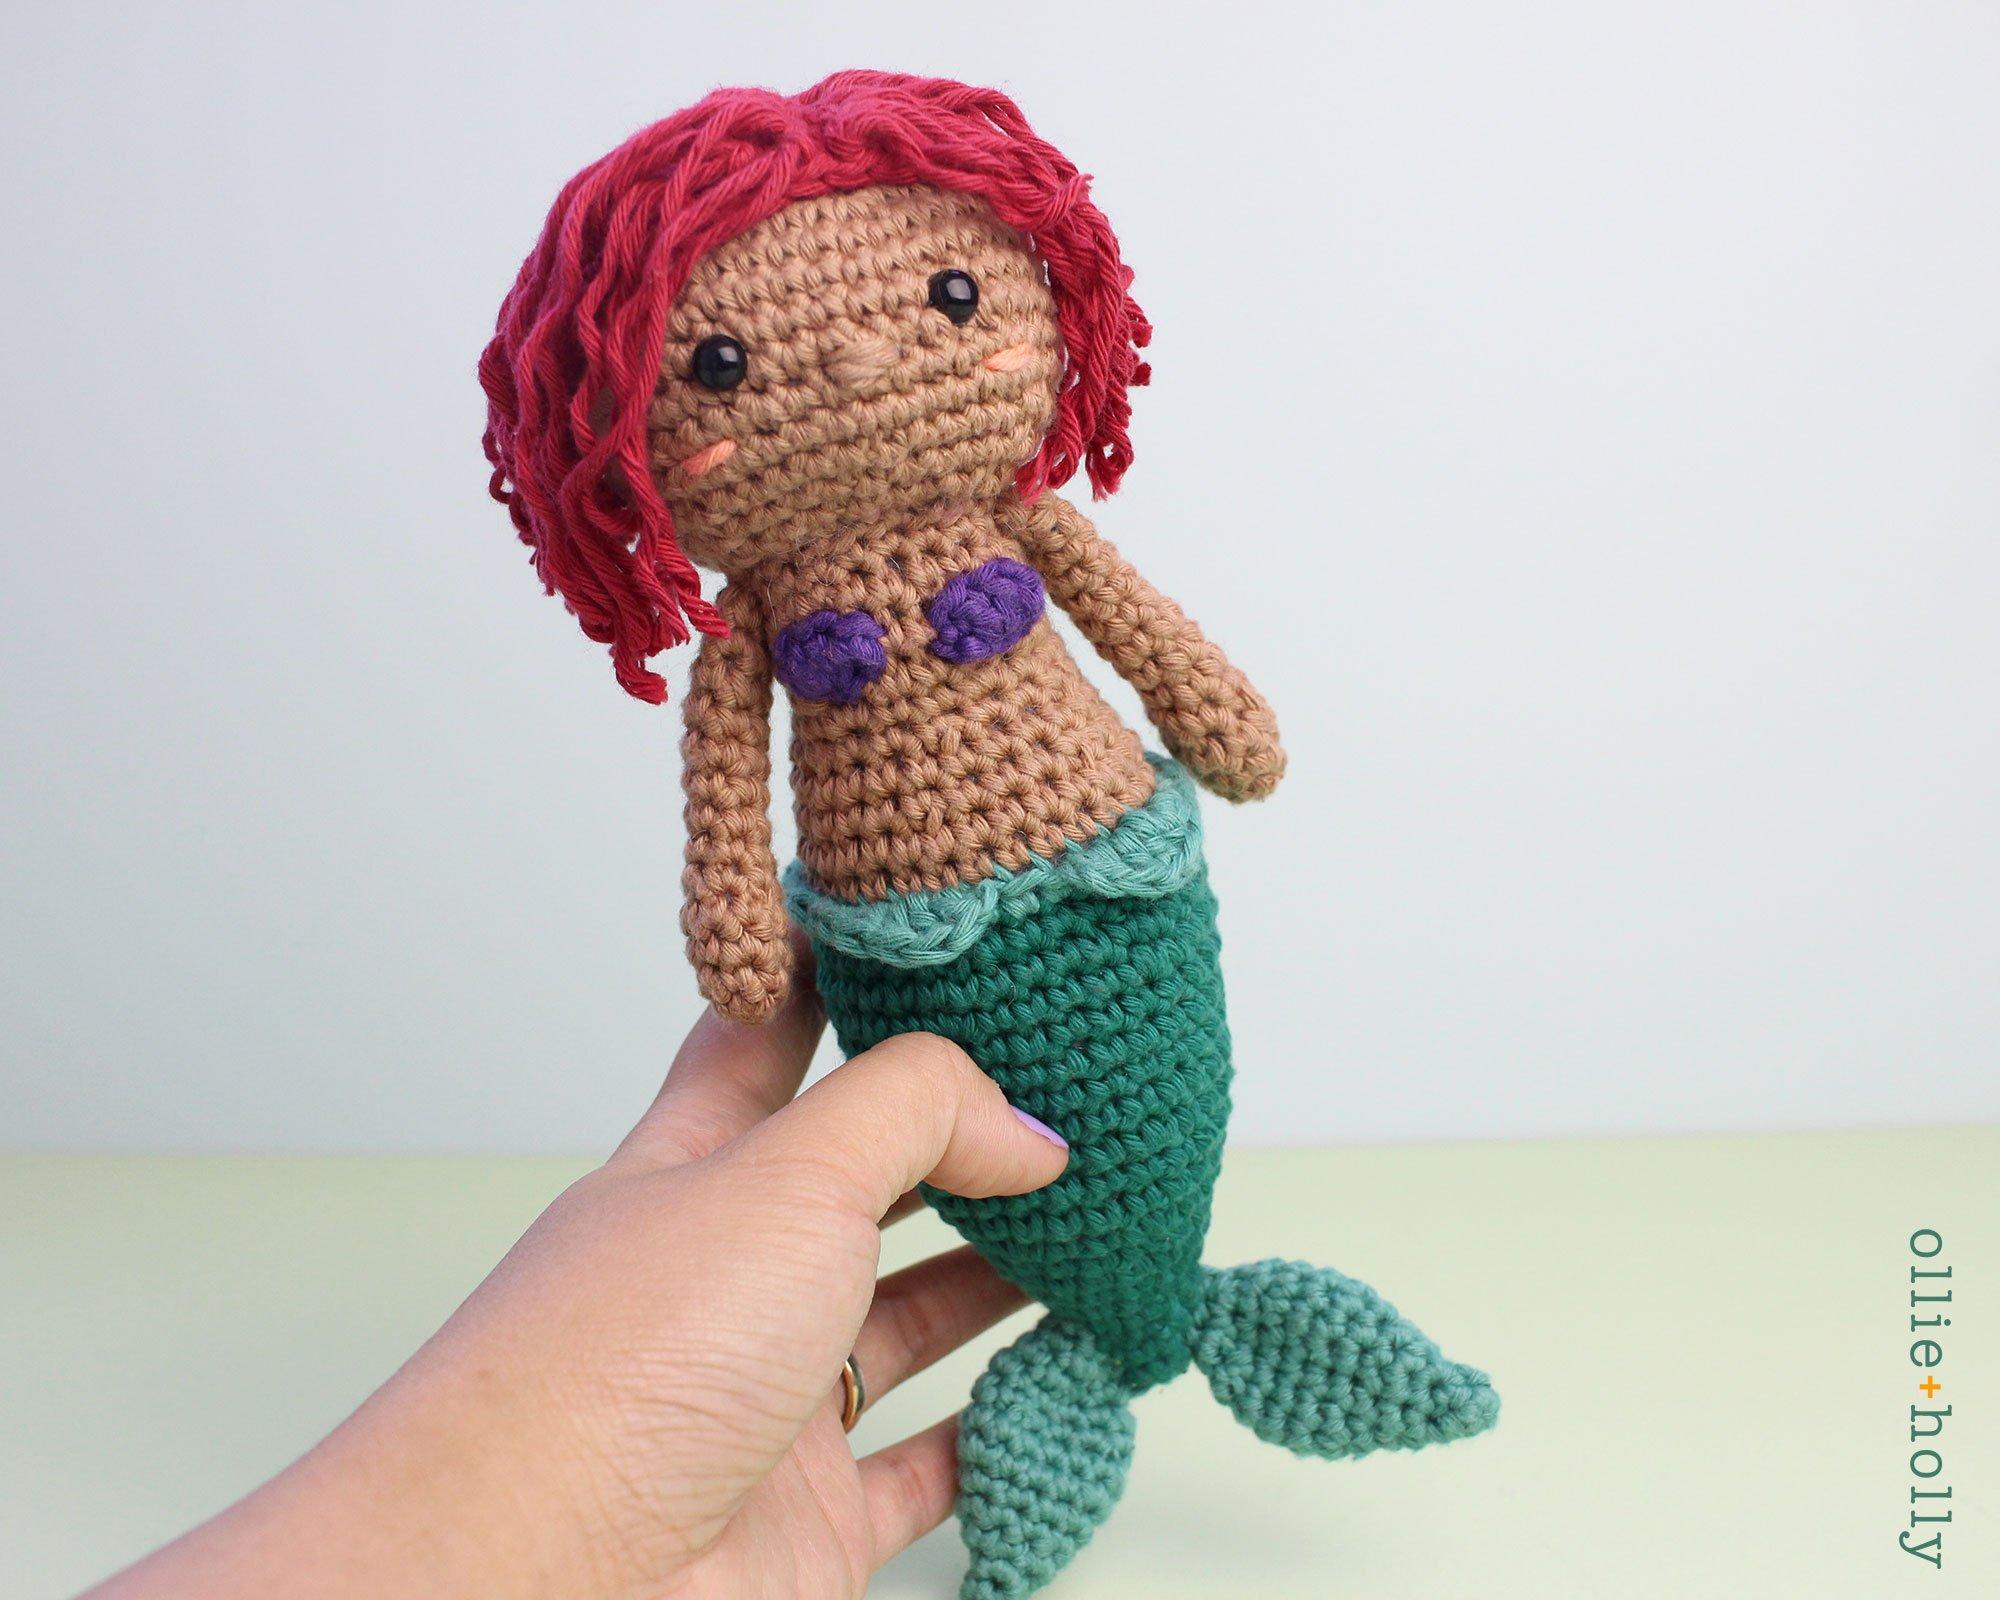 Coral the Mermaid (Free Amigurumi Crochet Pattern) - Sweet Softies ... | 1600x2000